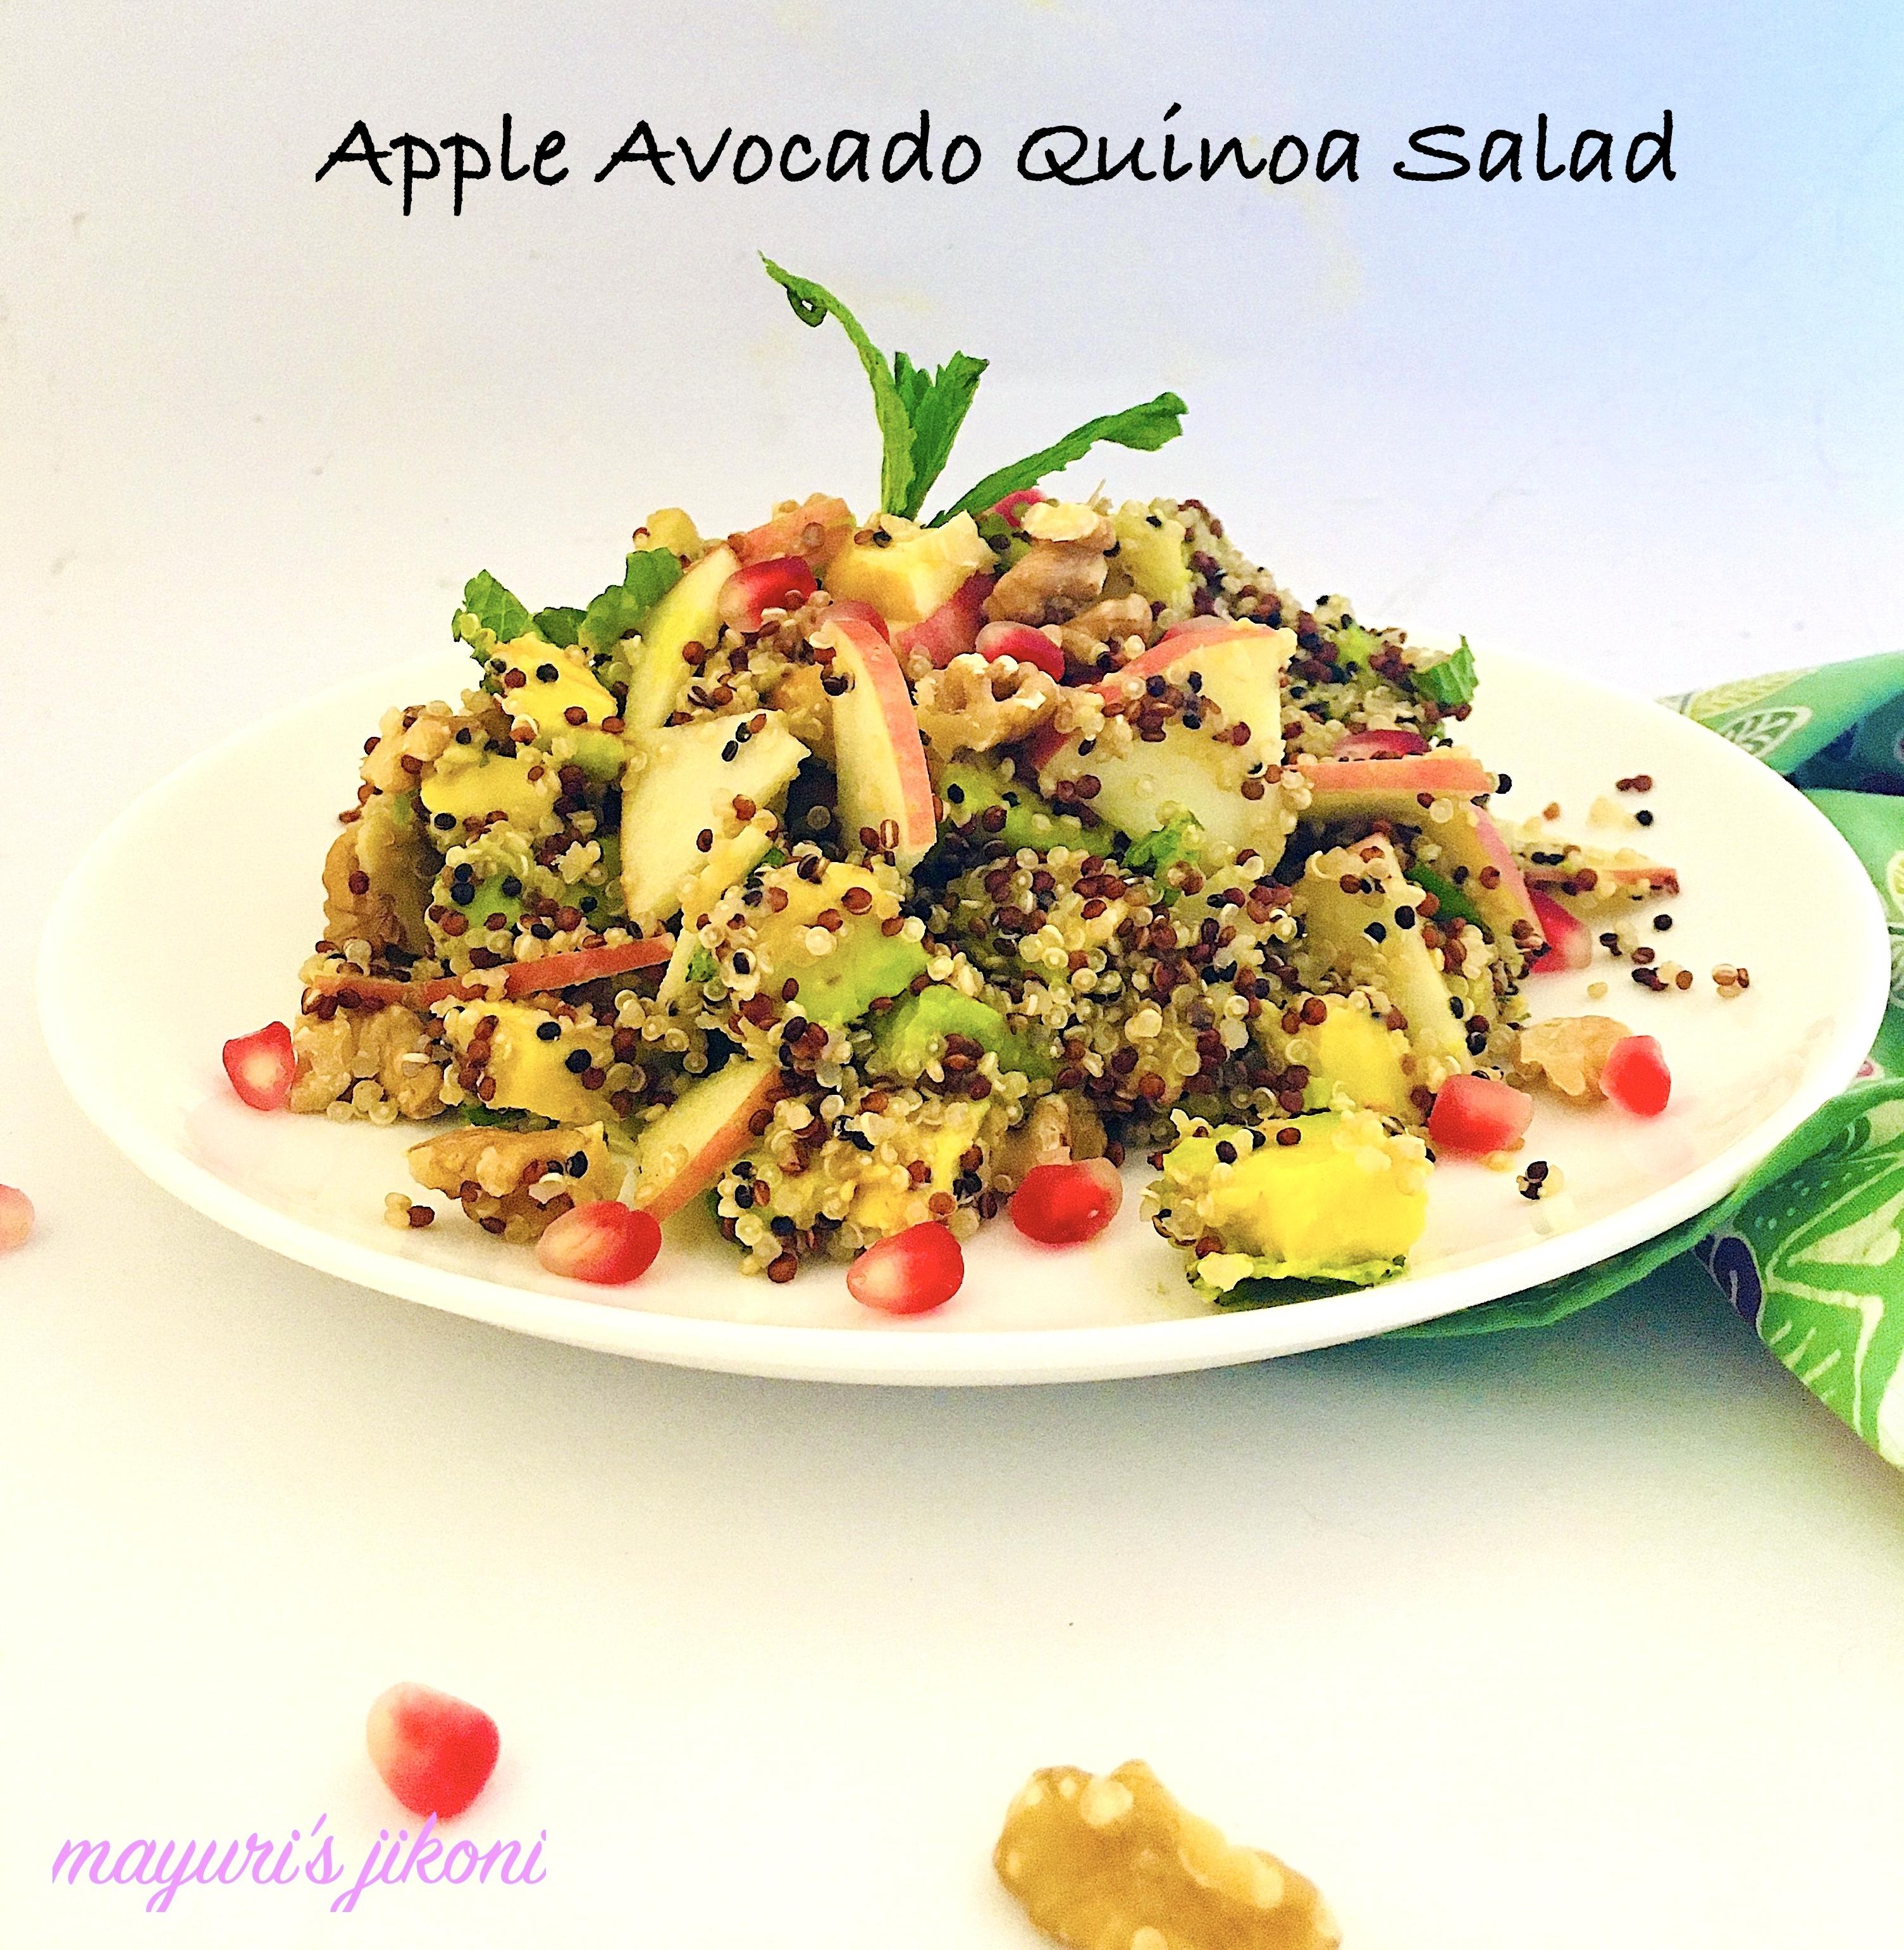 Avocado Salad Recipes In Tamil